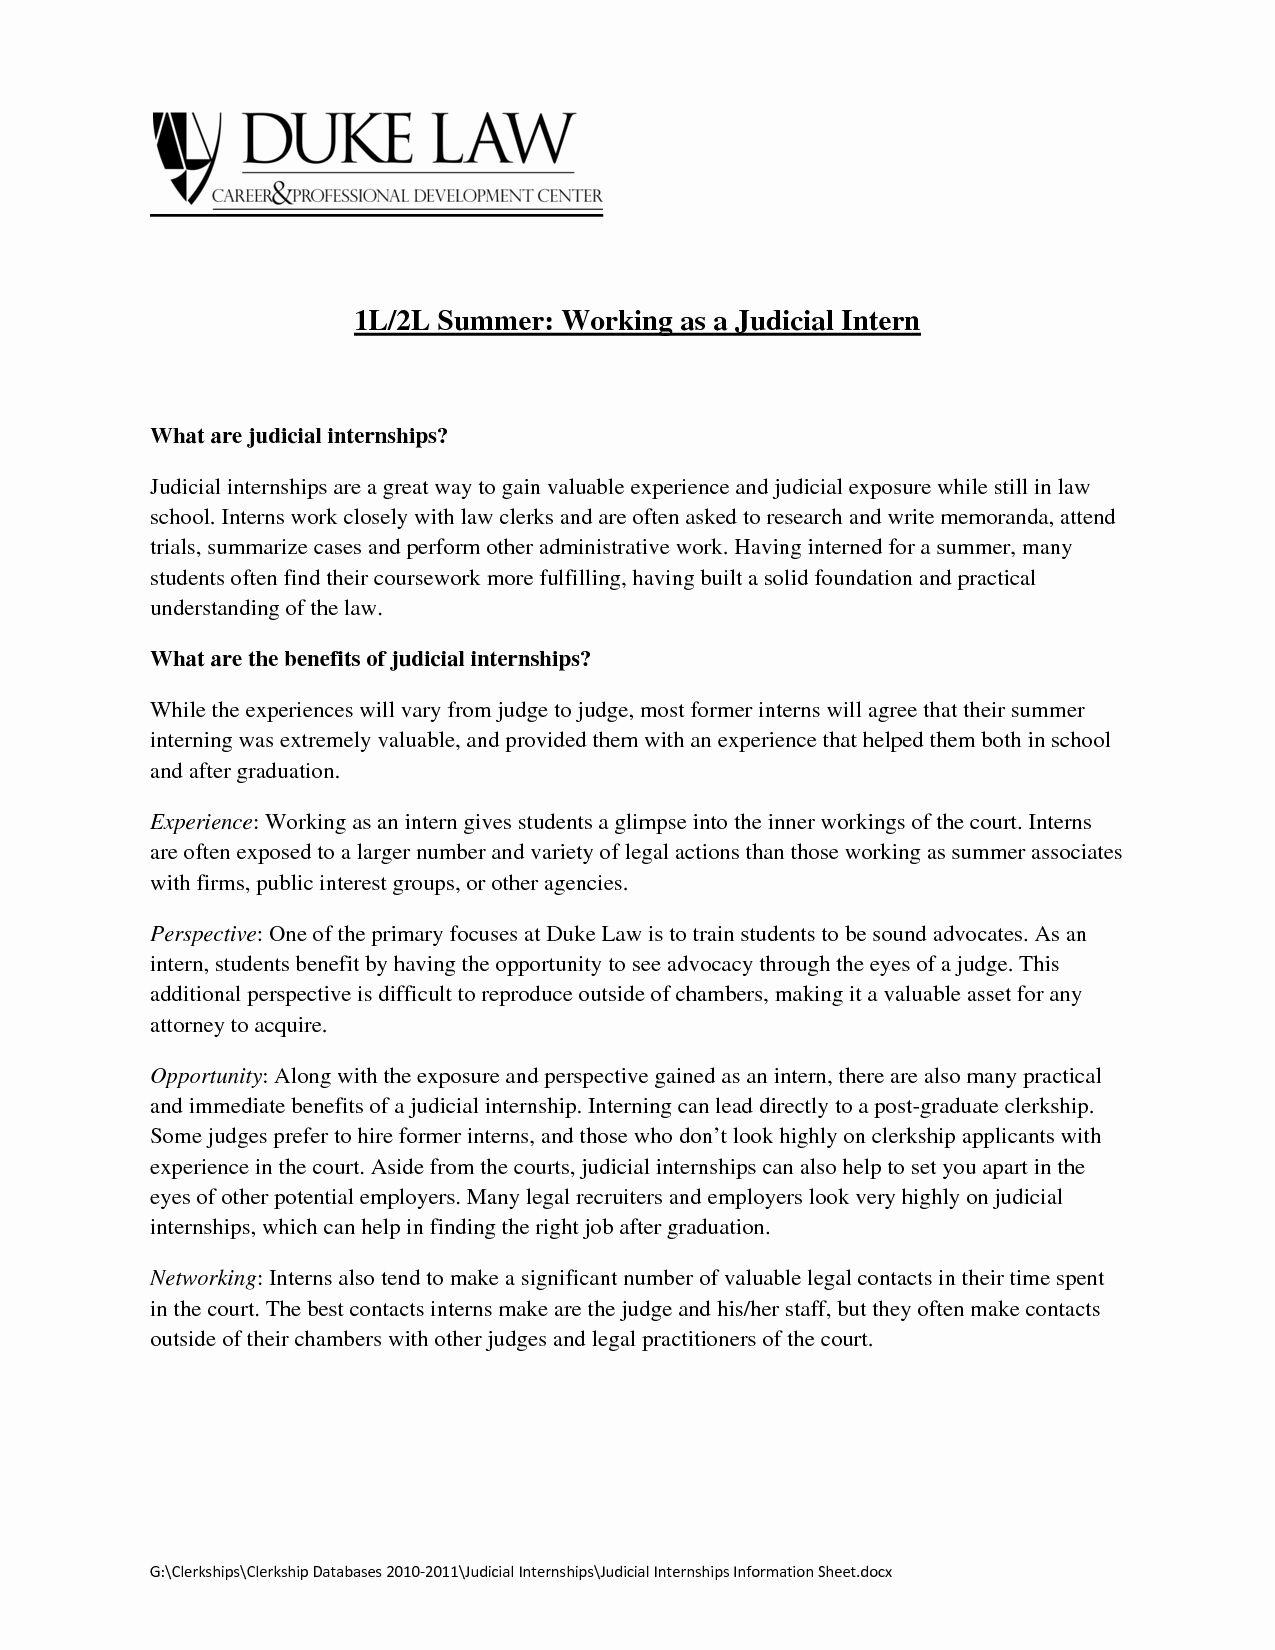 27 Harvard Cover Letter Resume Cover Letter Example